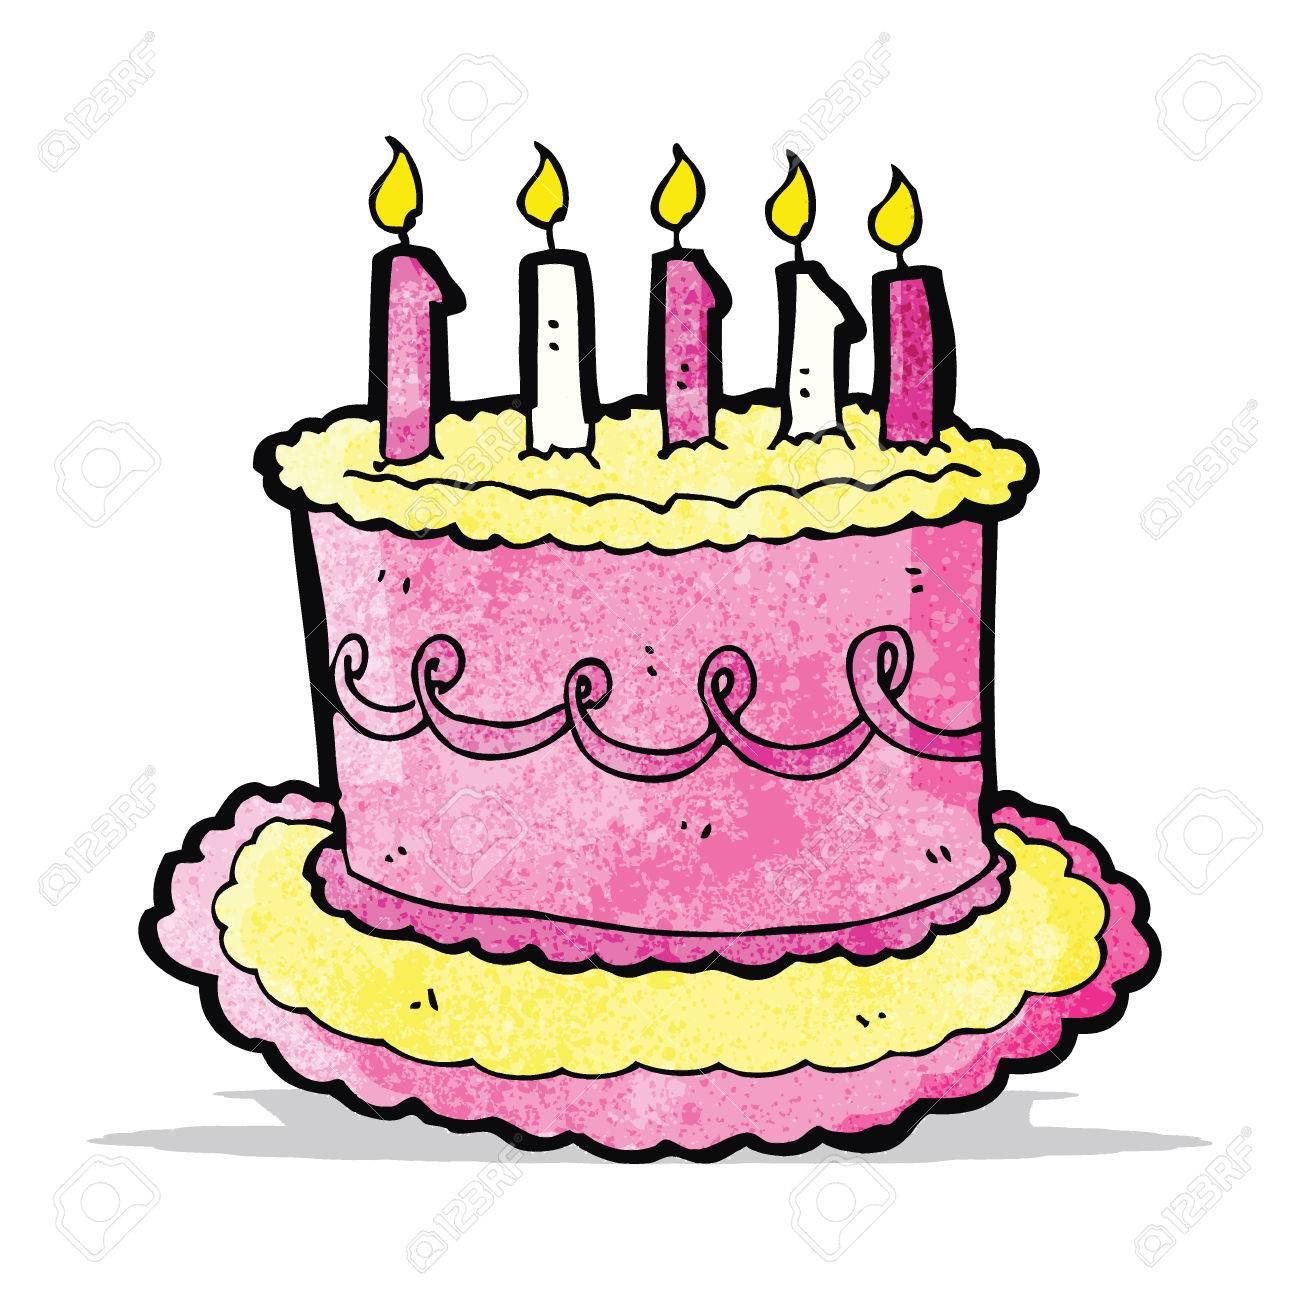 Cartoon Birthday Cake Royalty Free Cliparts Vectors And Stock